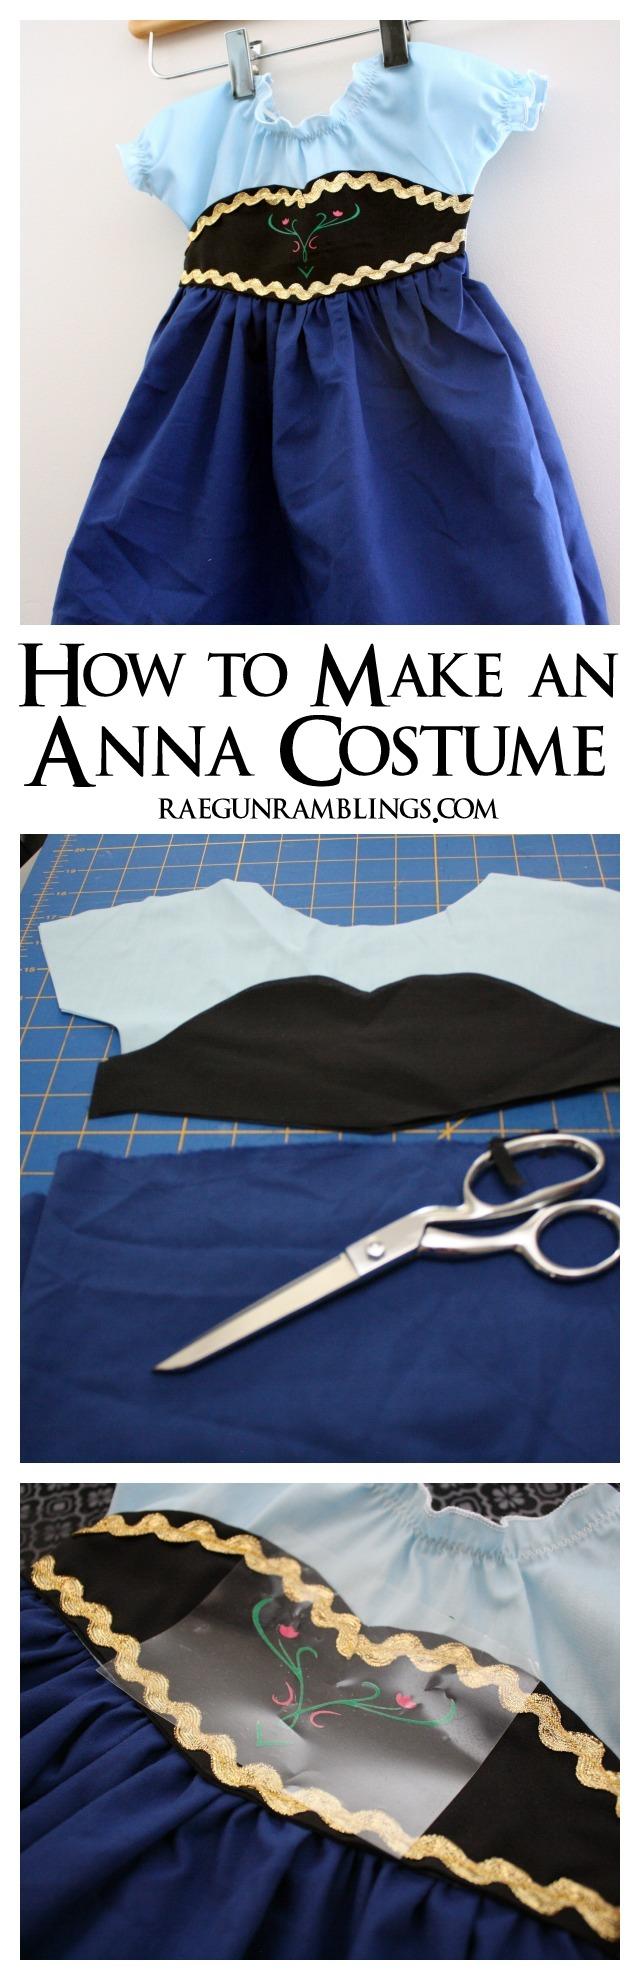 DIY Frozen Anna Costume Tutorial - Rae Gun Ramblings